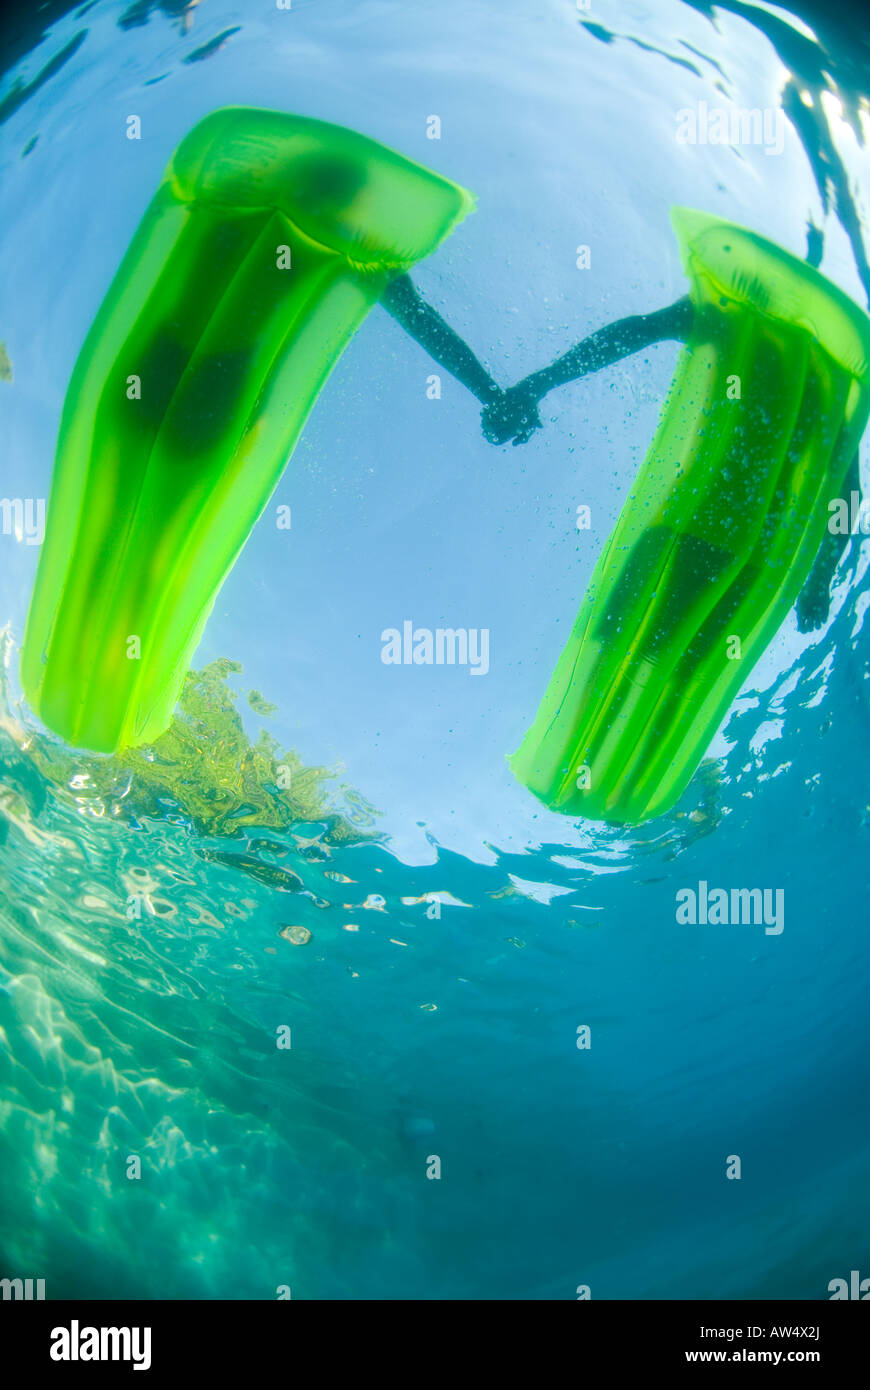 Una pareja de dos balsas verdes manos shot de underwater Imagen De Stock